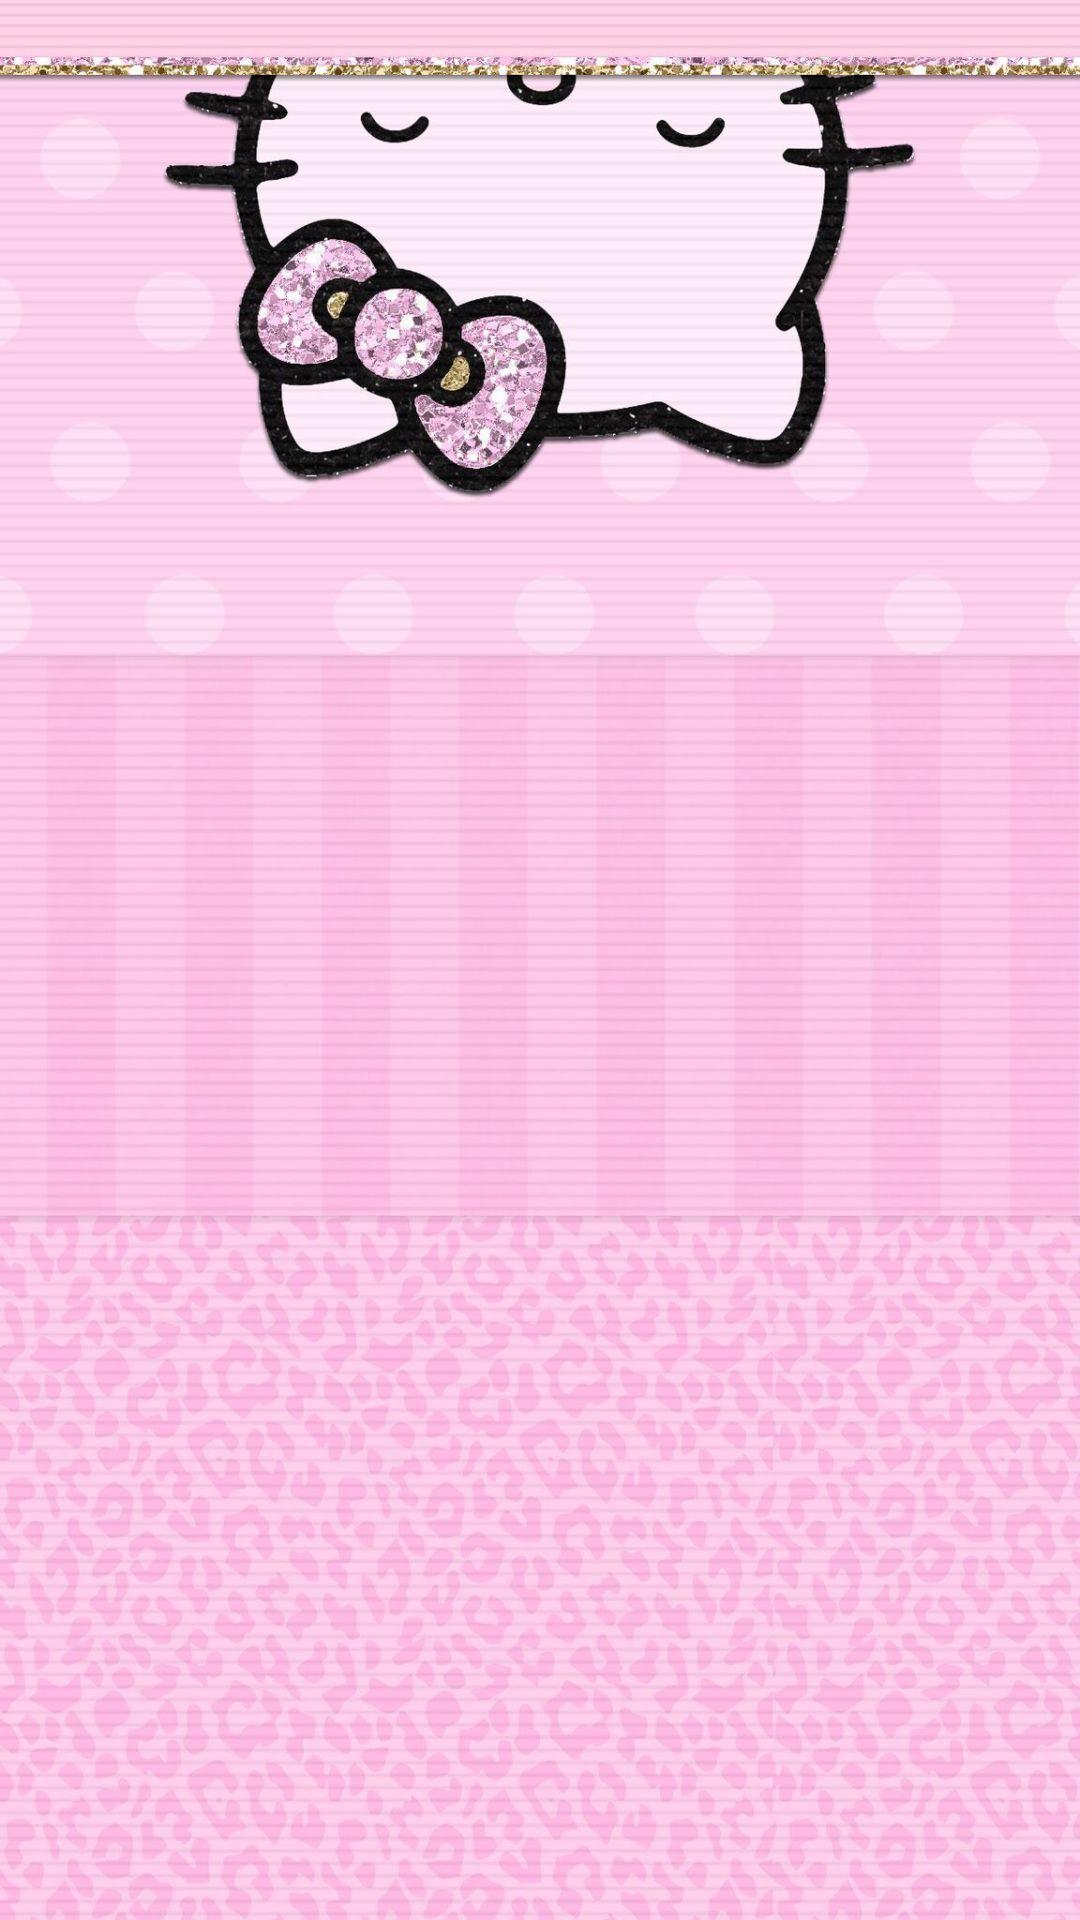 Simple Wallpaper Home Screen Hello Kitty - f553657312415ae700d5ee5bf658e384  HD_59516.jpg